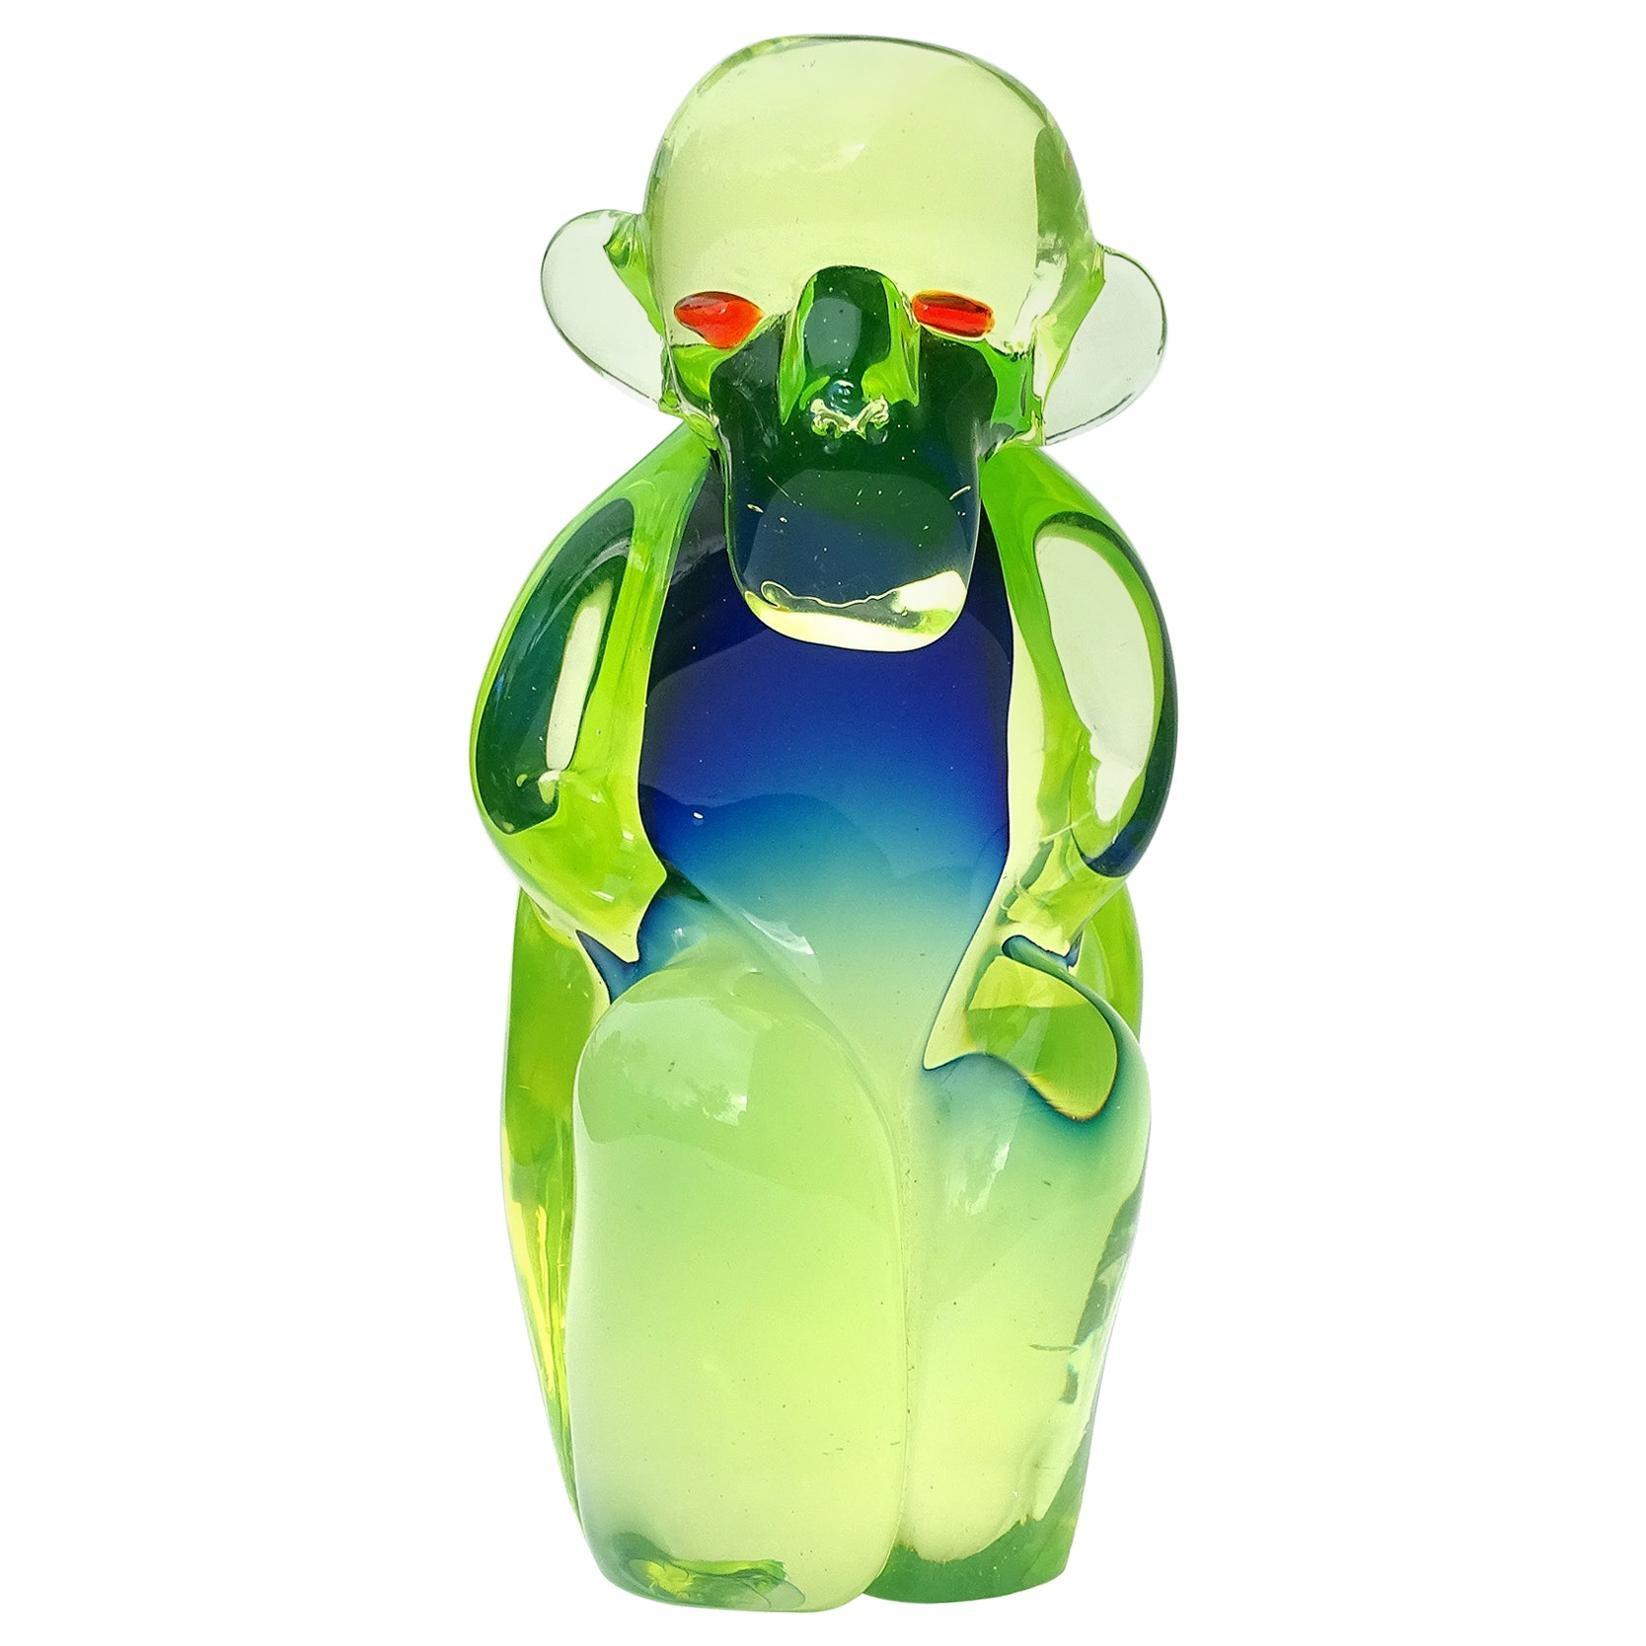 Salviati Murano Sommerso Uranium Green Blue Italian Art Glass Monkey Sculpture